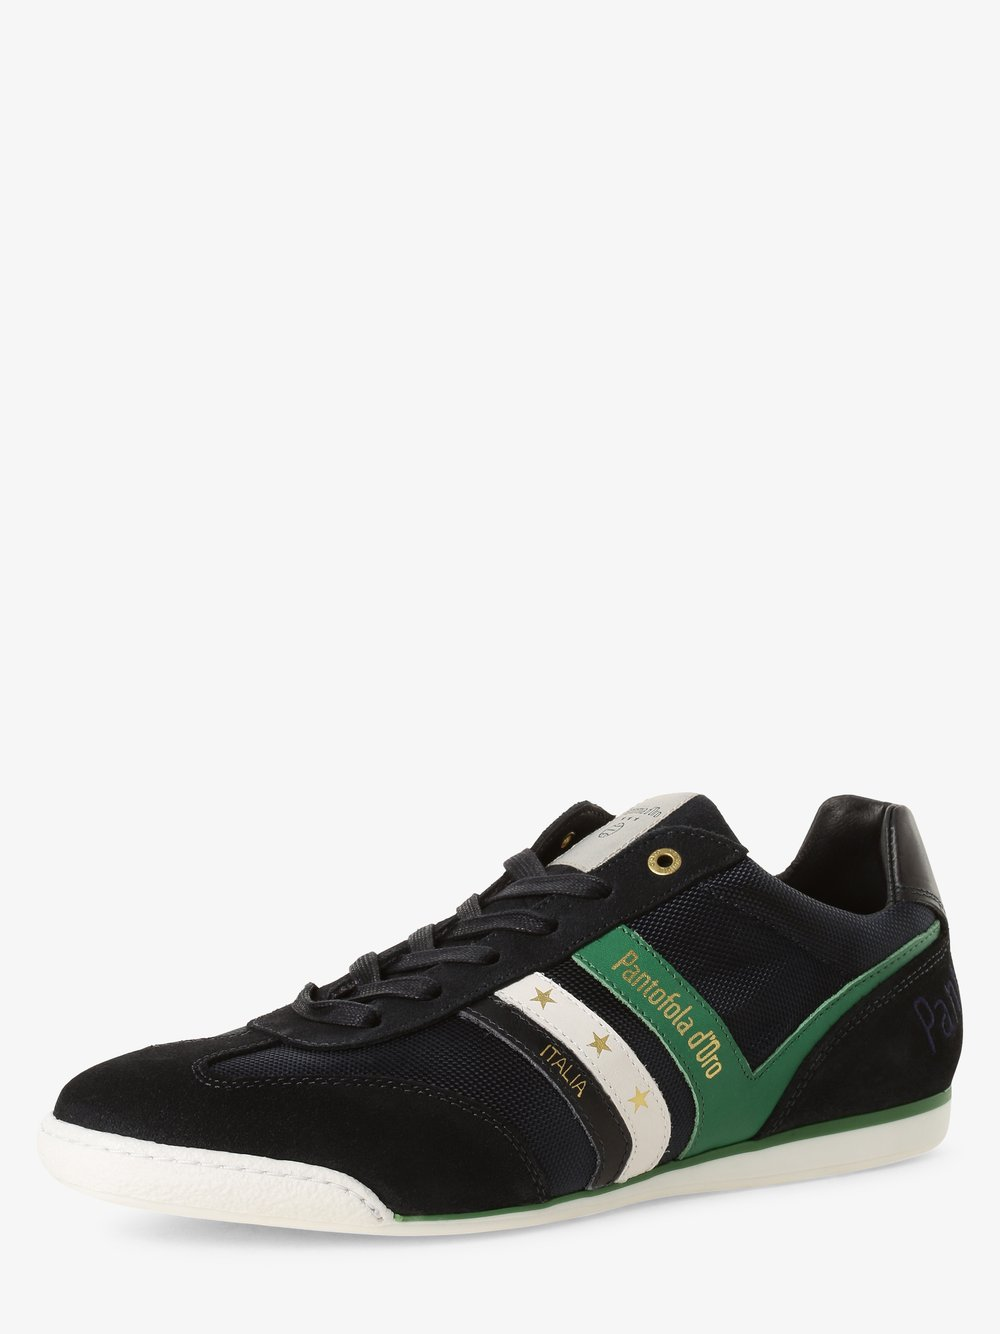 Pantofola d'Oro – Tenisówki męskie z dodatkiem skóry, niebieski Van Graaf 466225-0001